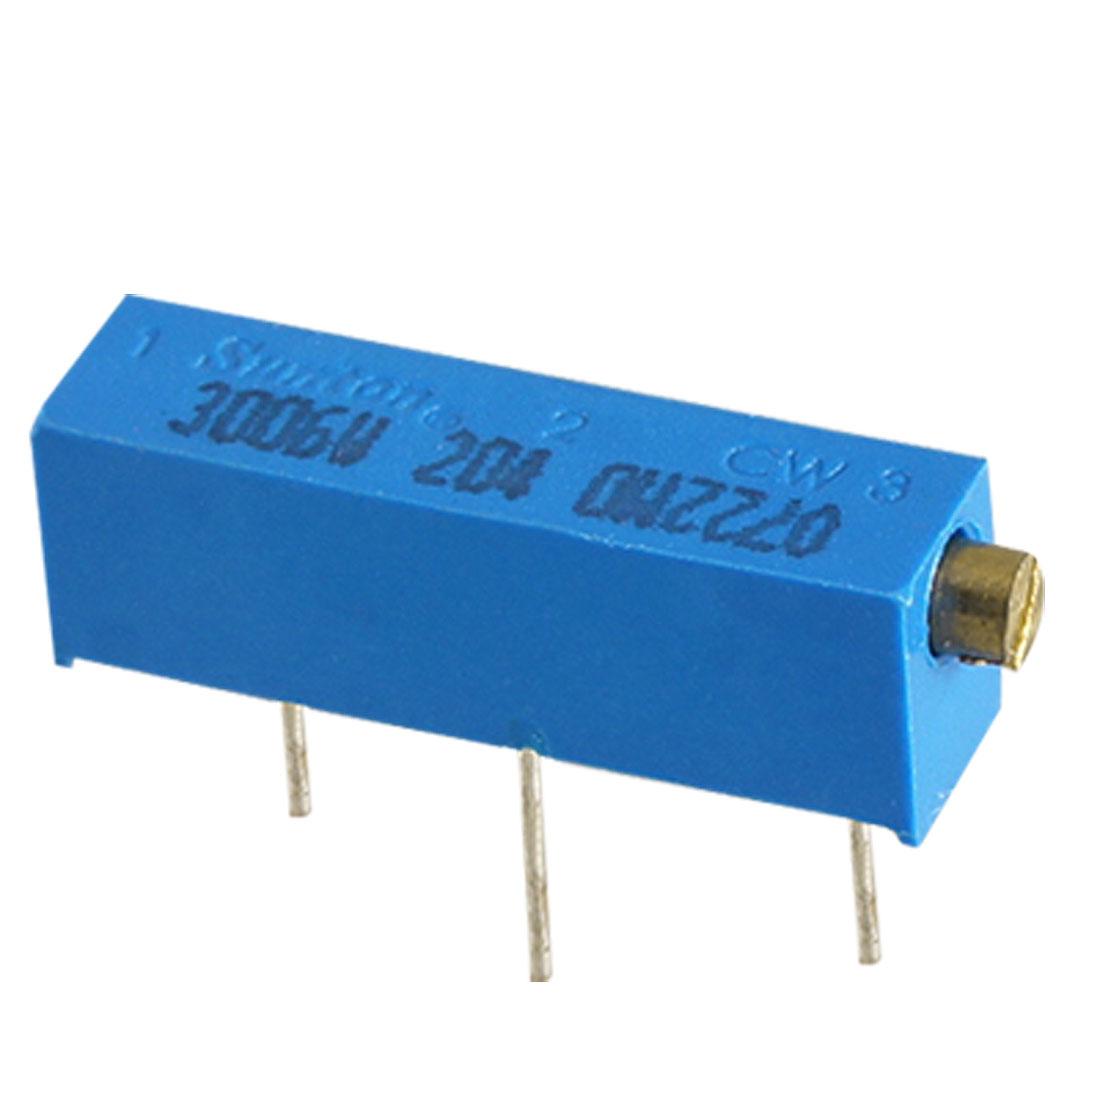 3006P-1-204 200K Ohm Cermet Trimmer Potentiometer 15 Turn 25 Pcs